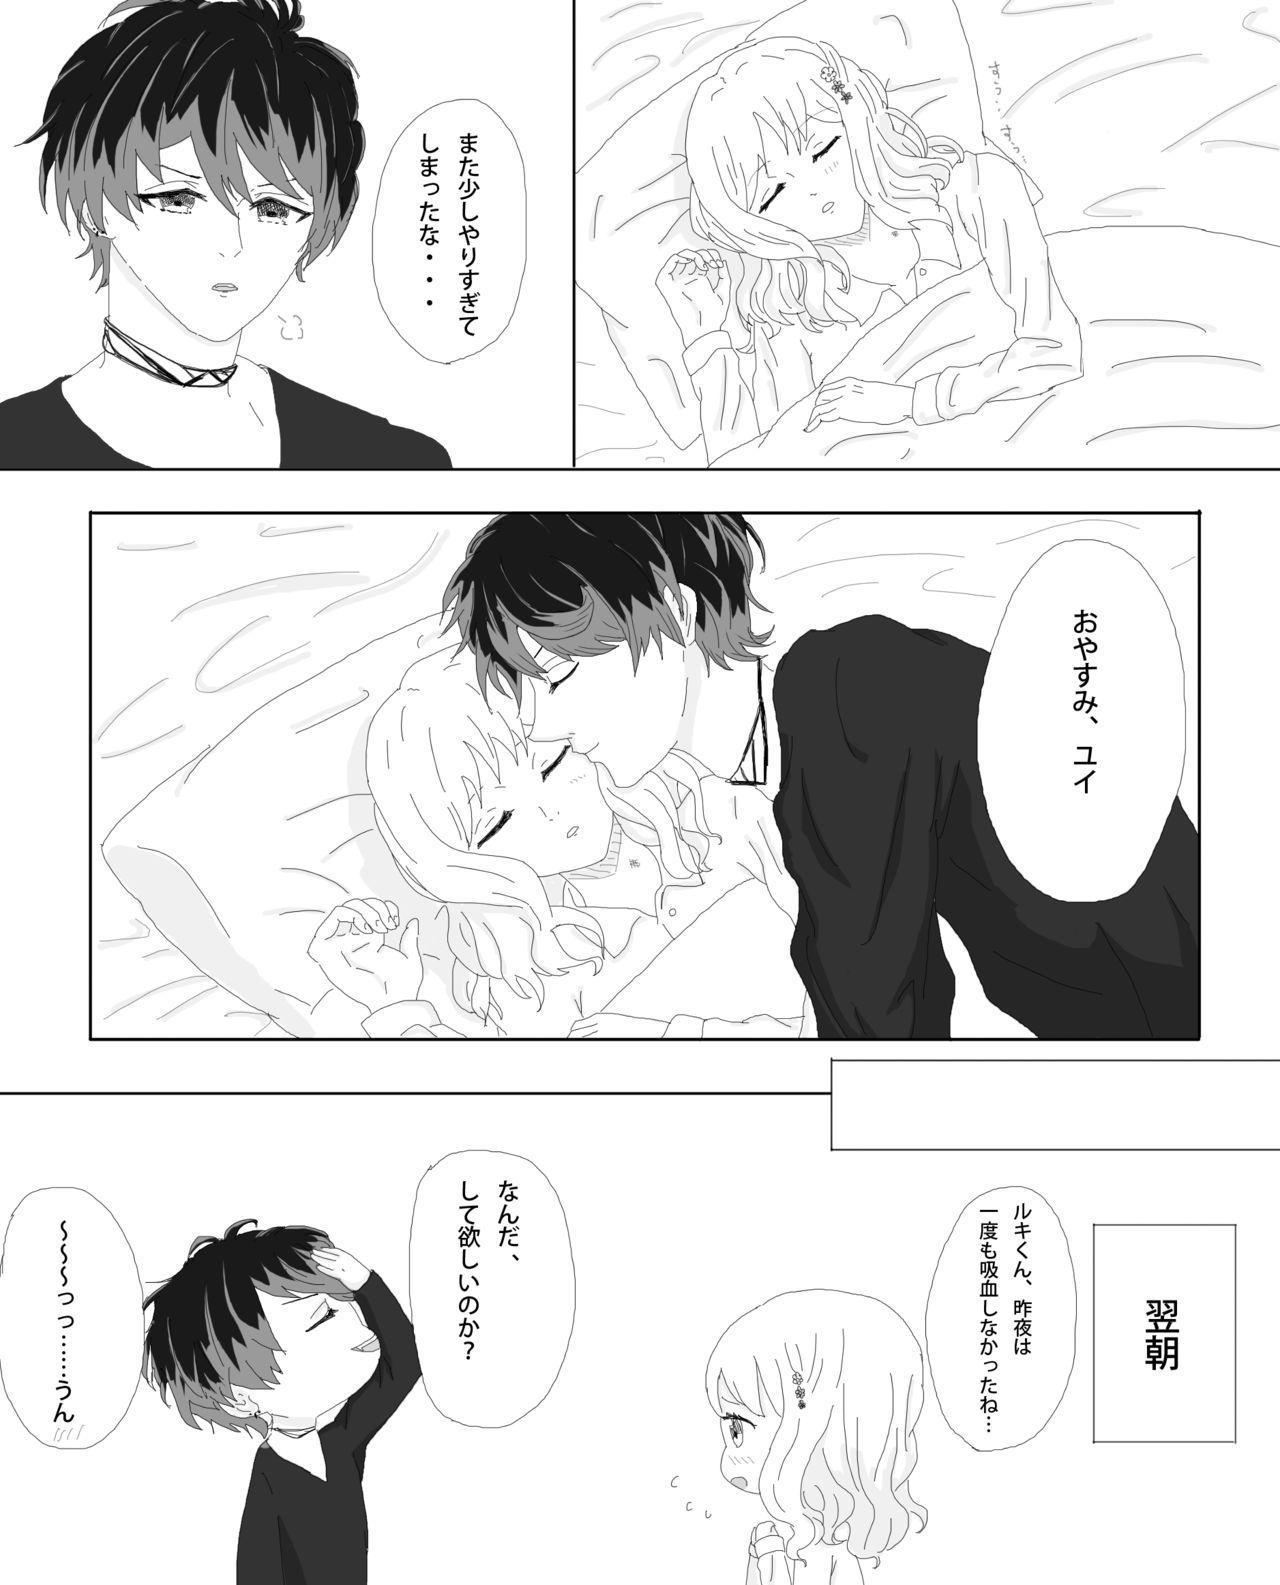 Rukiyui-chan no wo Midarana Manga 6